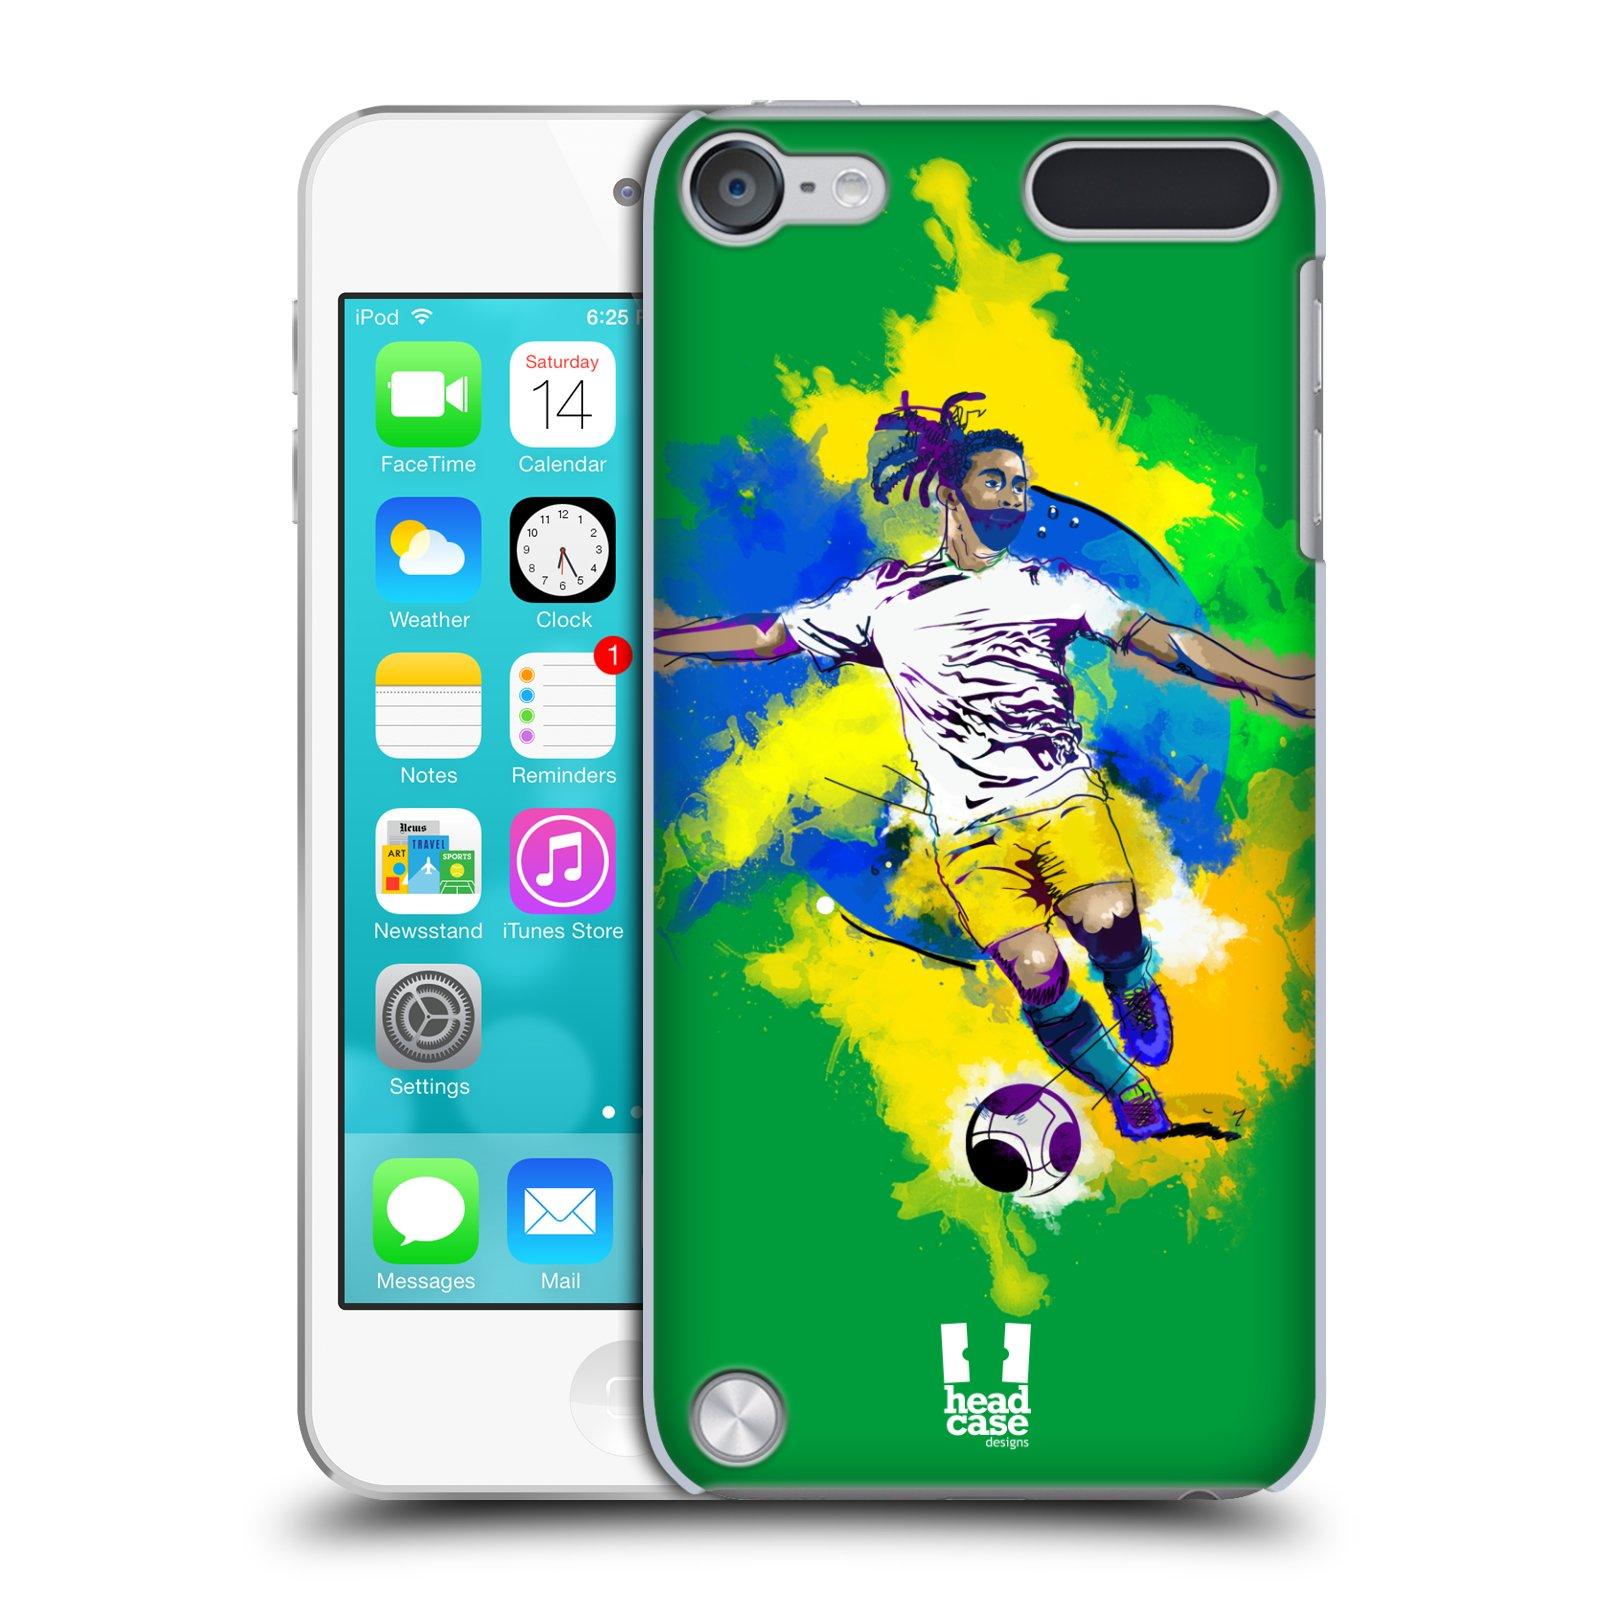 HEAD-CASE-FOOTBALL-Splash-SNAP-ON-CASE-PER-APPLE-IPOD-TOUCH-5G-5A-GENERAZIONE